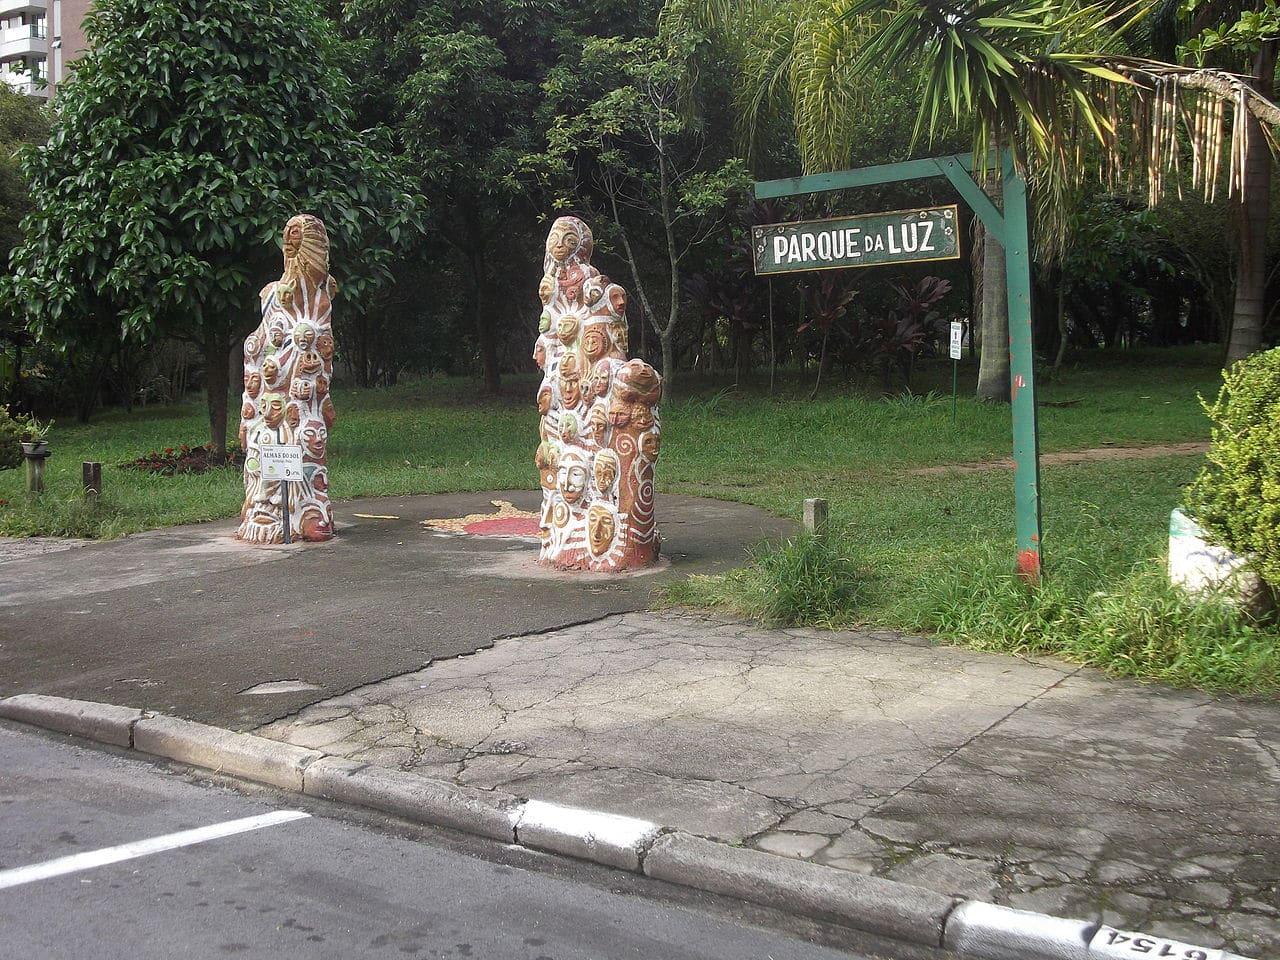 pontos turísticos florianopolis